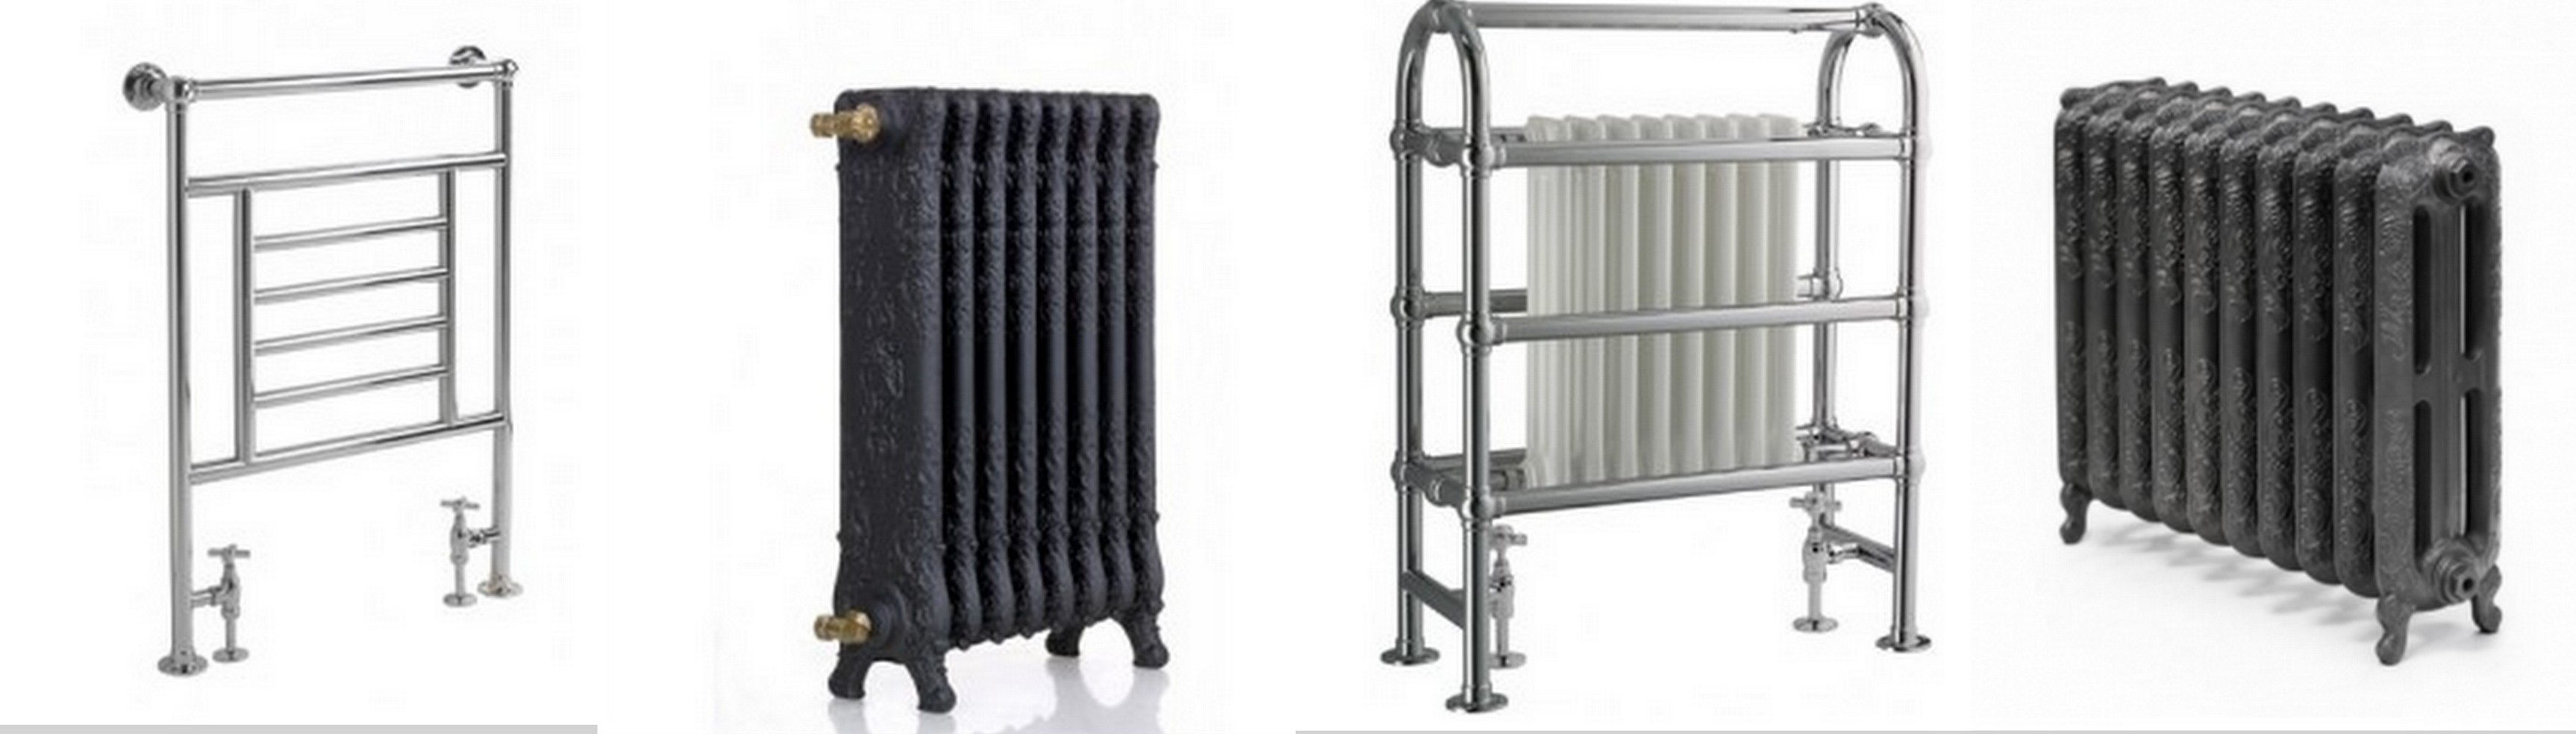 radiateur retro fonte belle epoque chauffage central. Black Bedroom Furniture Sets. Home Design Ideas